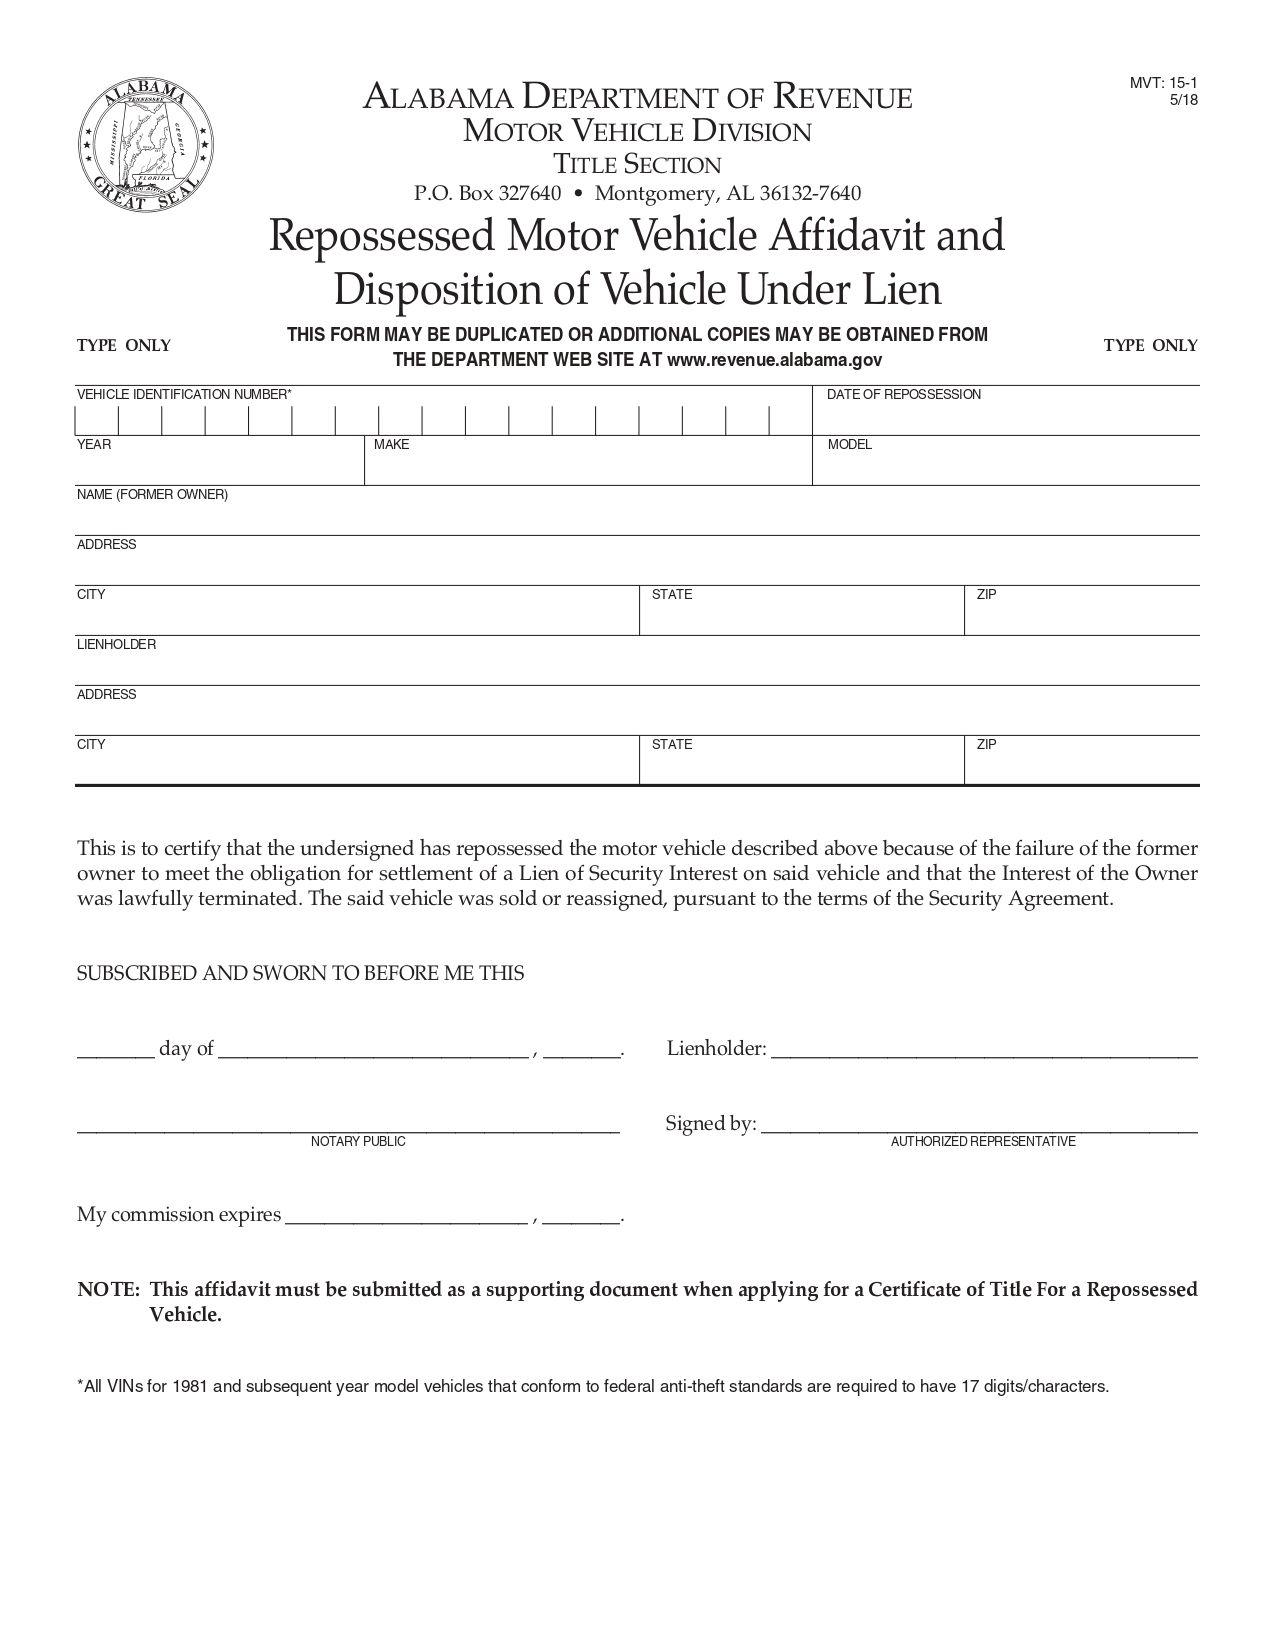 Get A Replacement Car Title Car title, Motor car